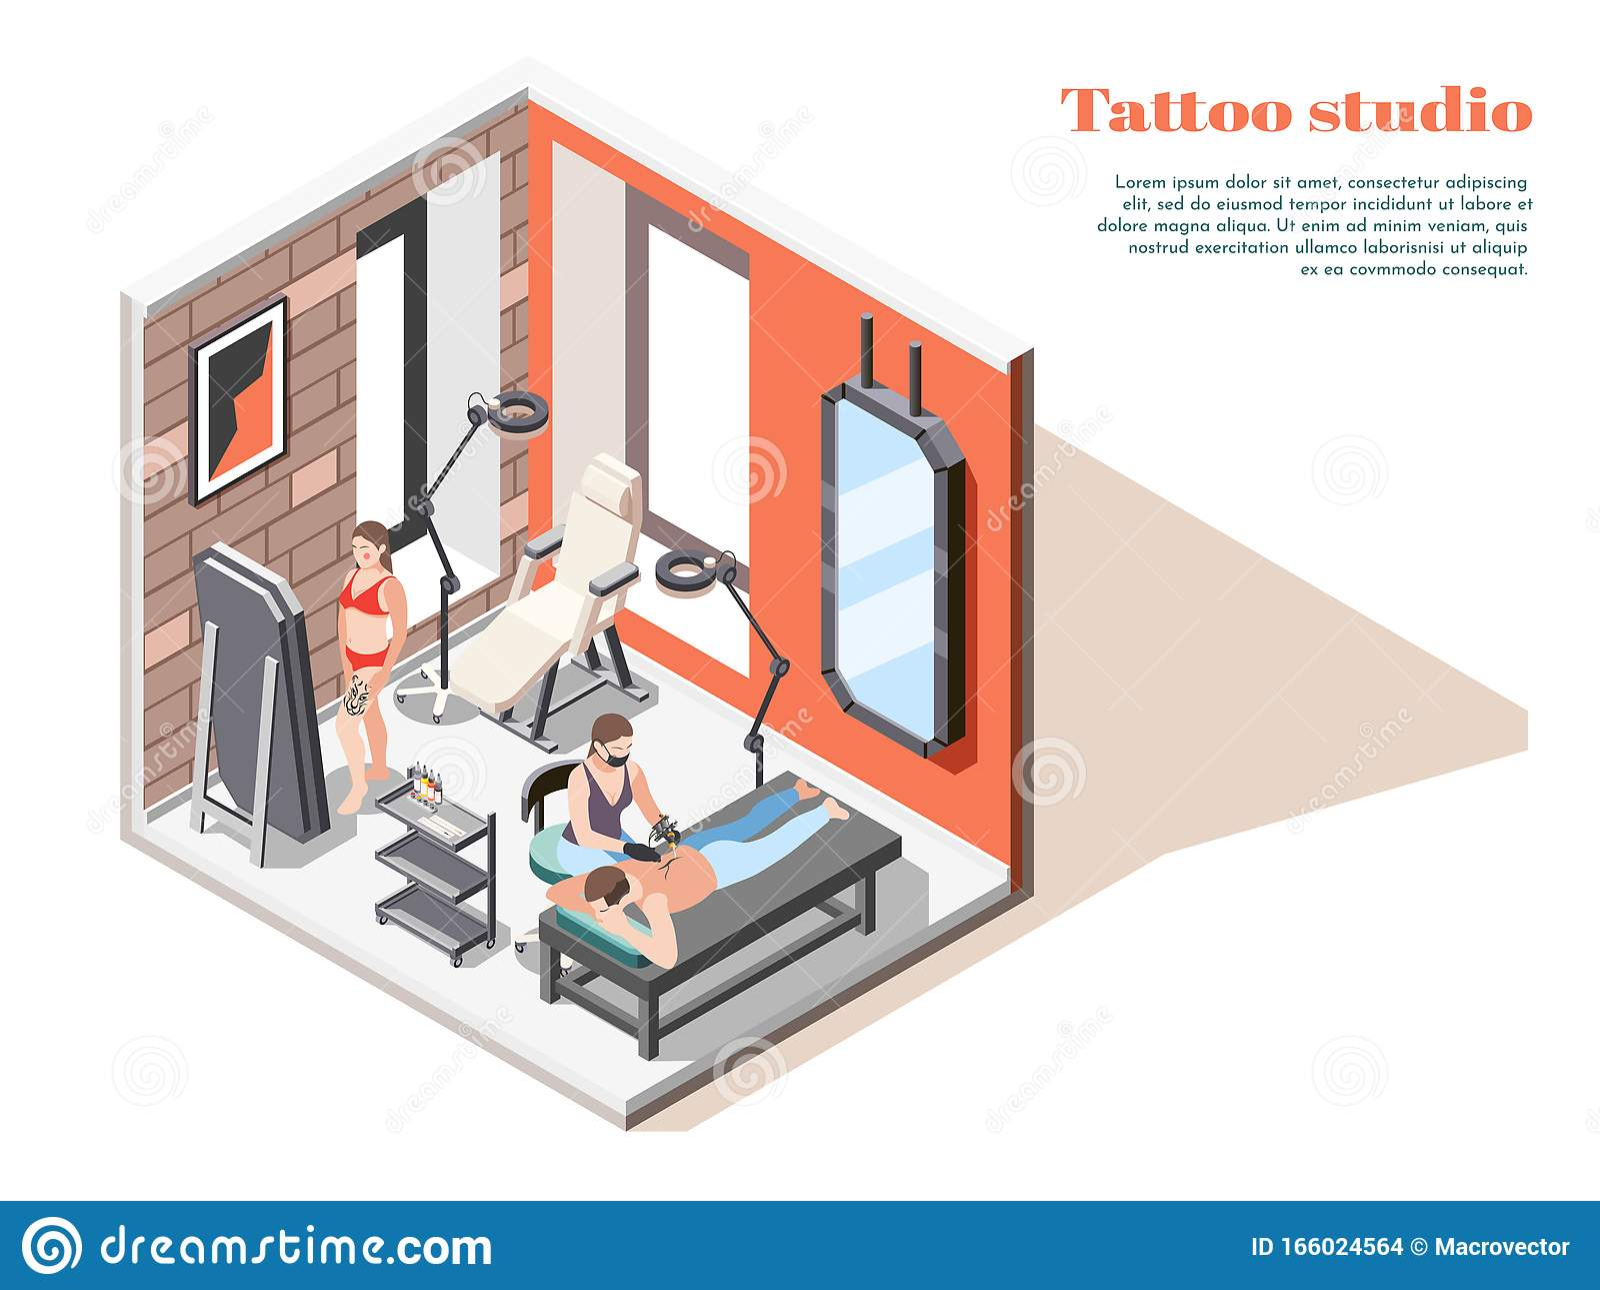 Tattoo Studio Isometric Composition Stock Vector Illustration Of Fashion Mirror 166024564